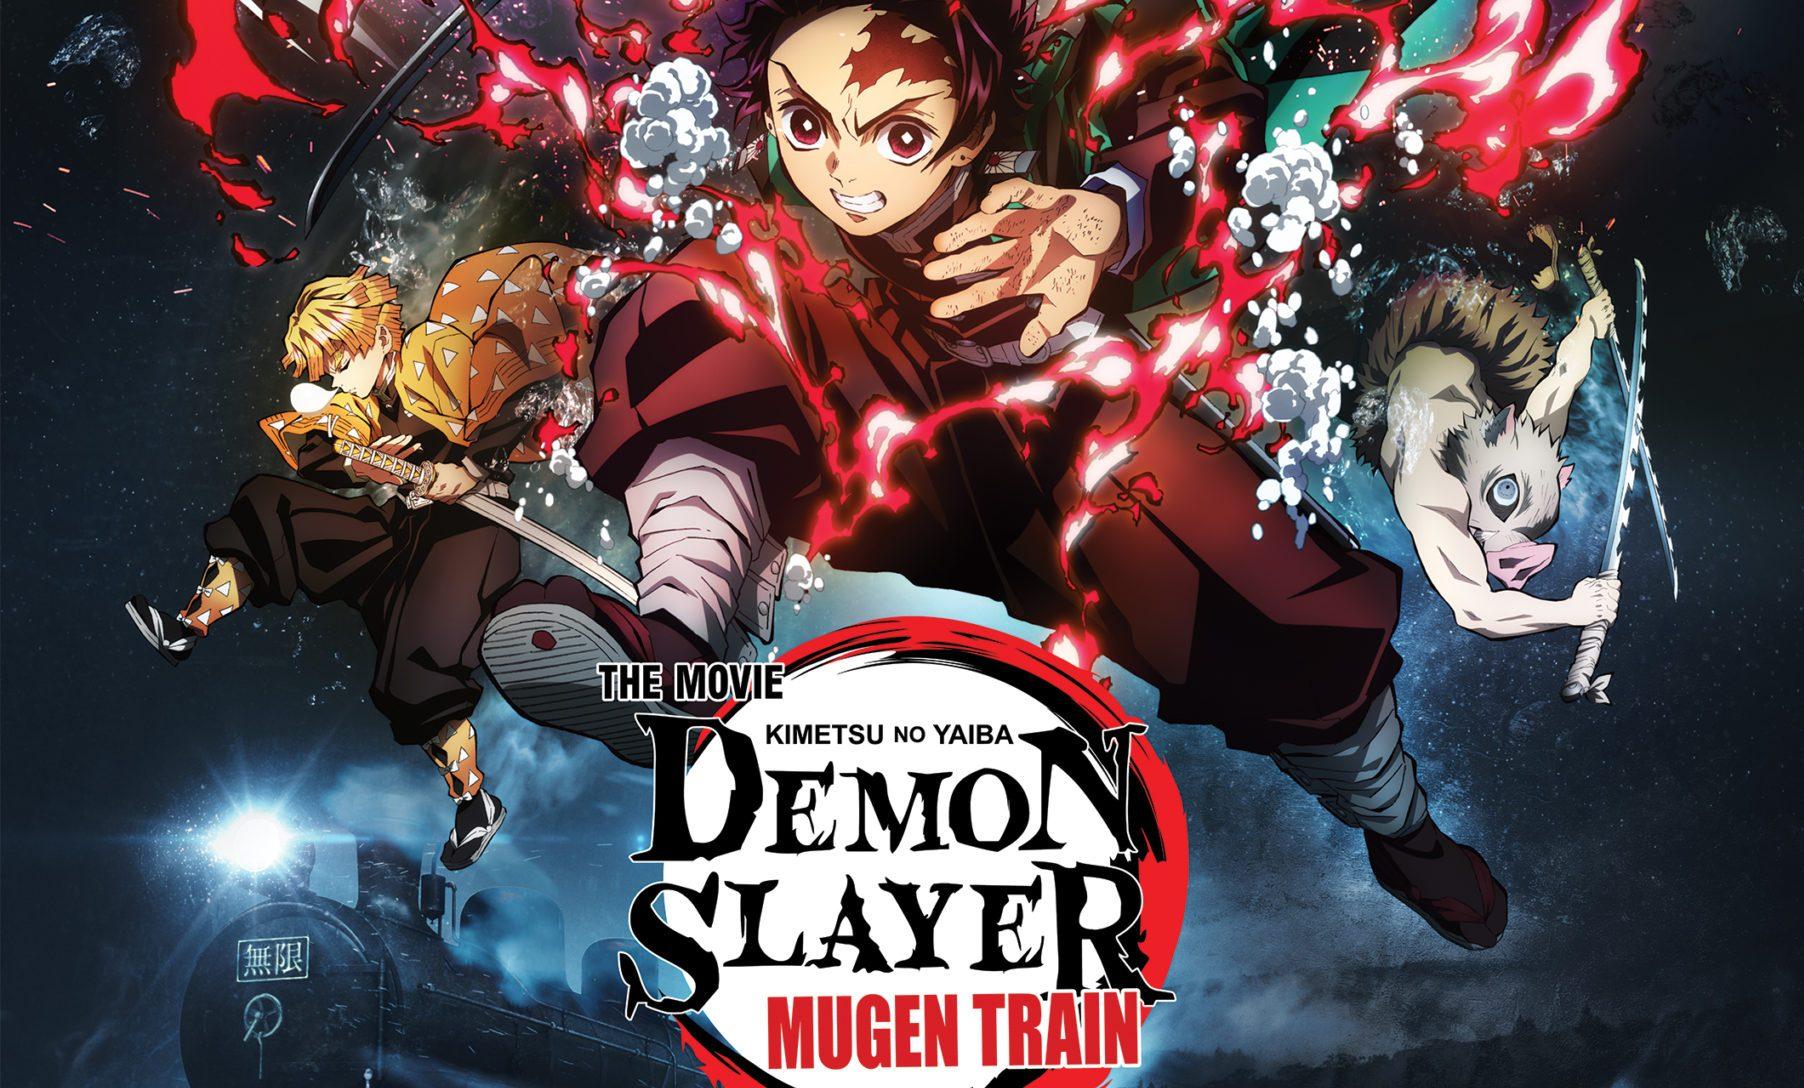 Demon Slayer: Kimetsu no Yaiba Mugen Train Movie English Subtitle Trailers Has Finally Been Released. Here are The Detailed Updates